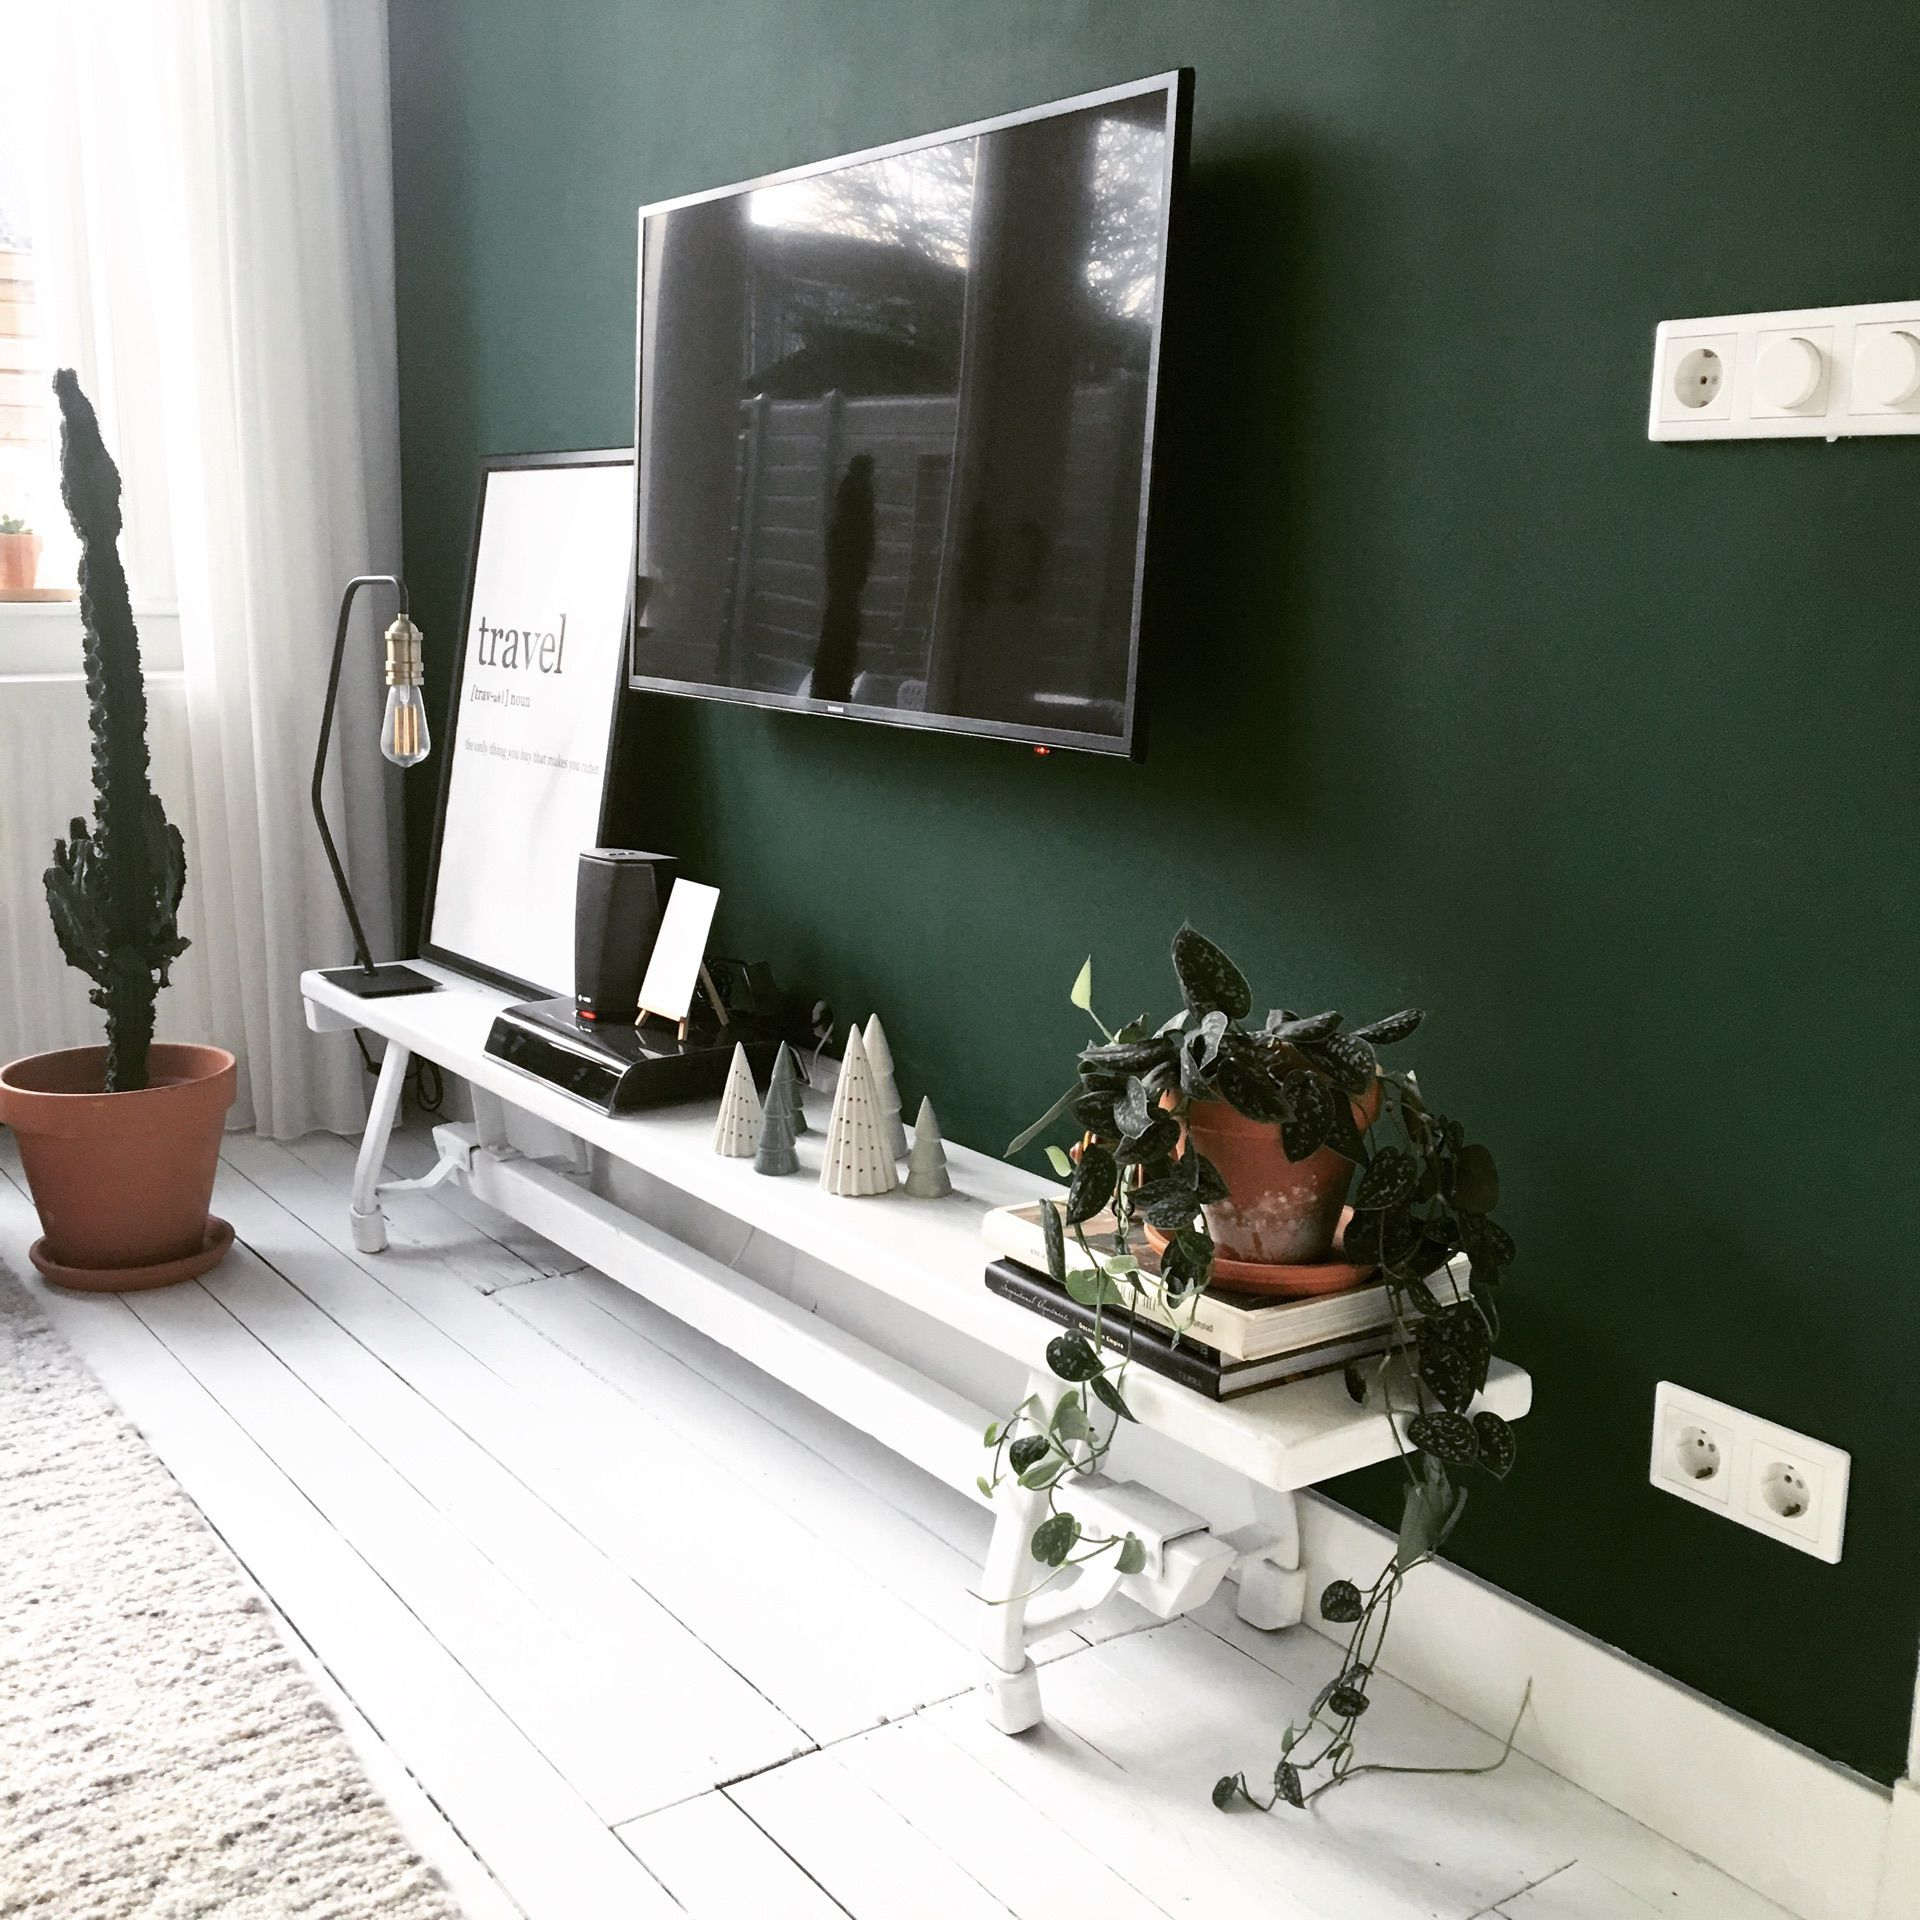 Woonkamer - Binnenkijken bij stijlmijnplek | Wohnzimmer | Pinterest ...